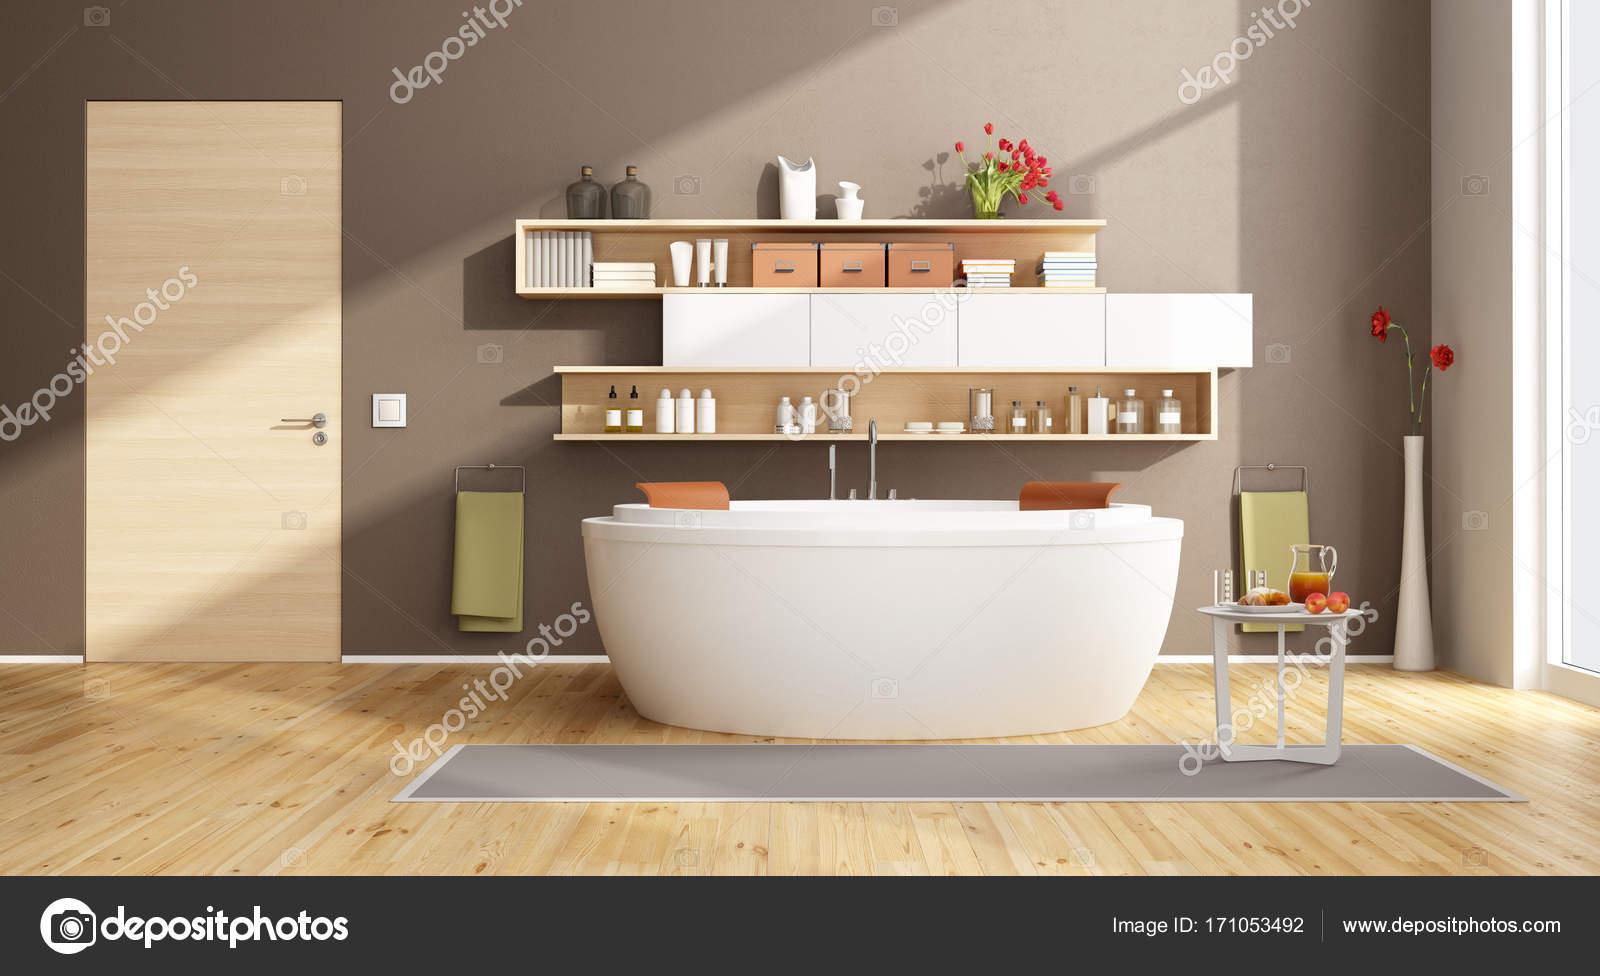 Vasca Da Bagno Rotonda : Bagno moderno con vasca da bagno rotonda u2014 foto stock